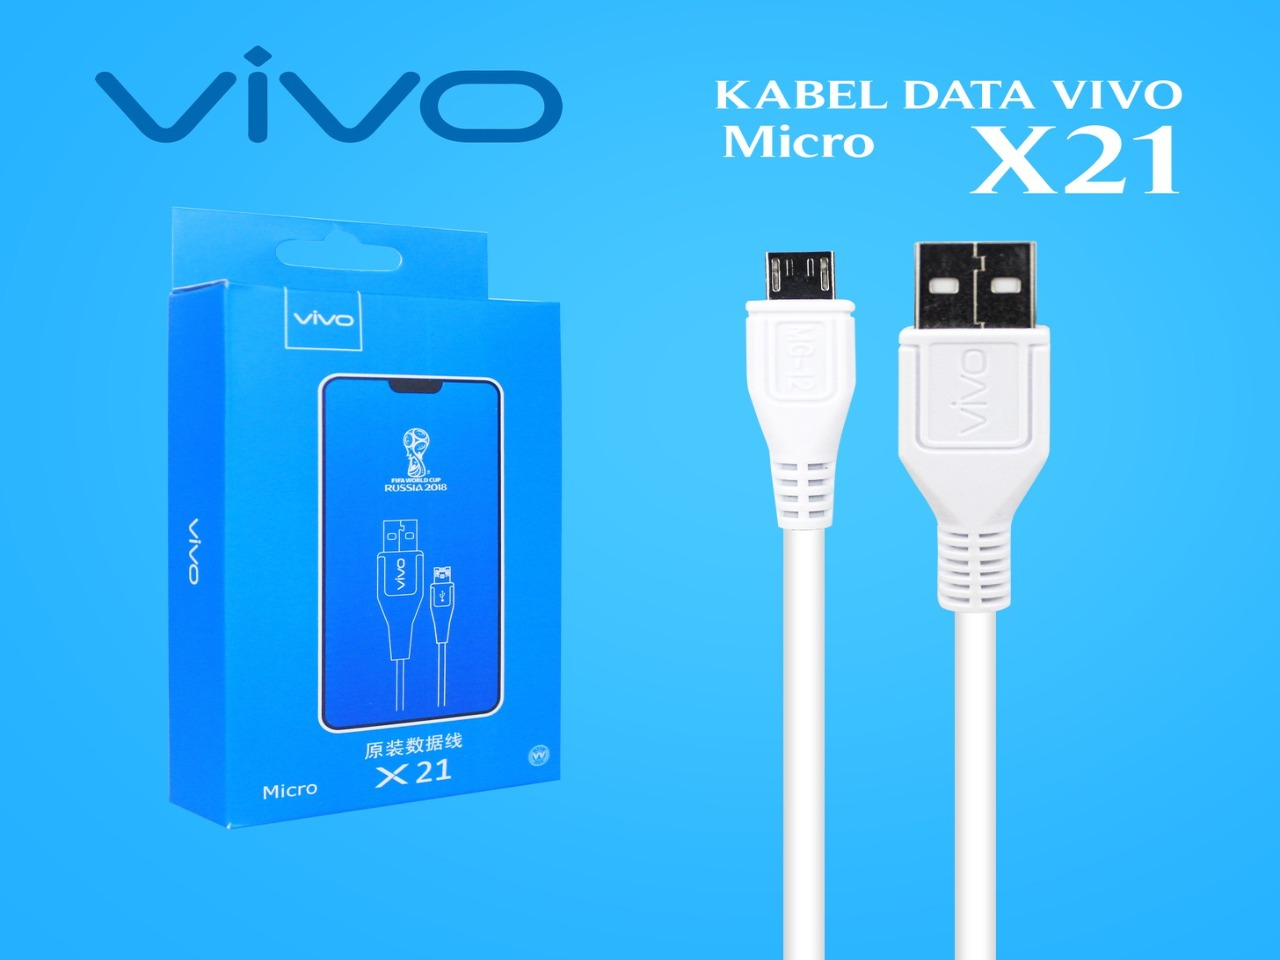 KABEL-DATA-VIVO-X21-MICRO